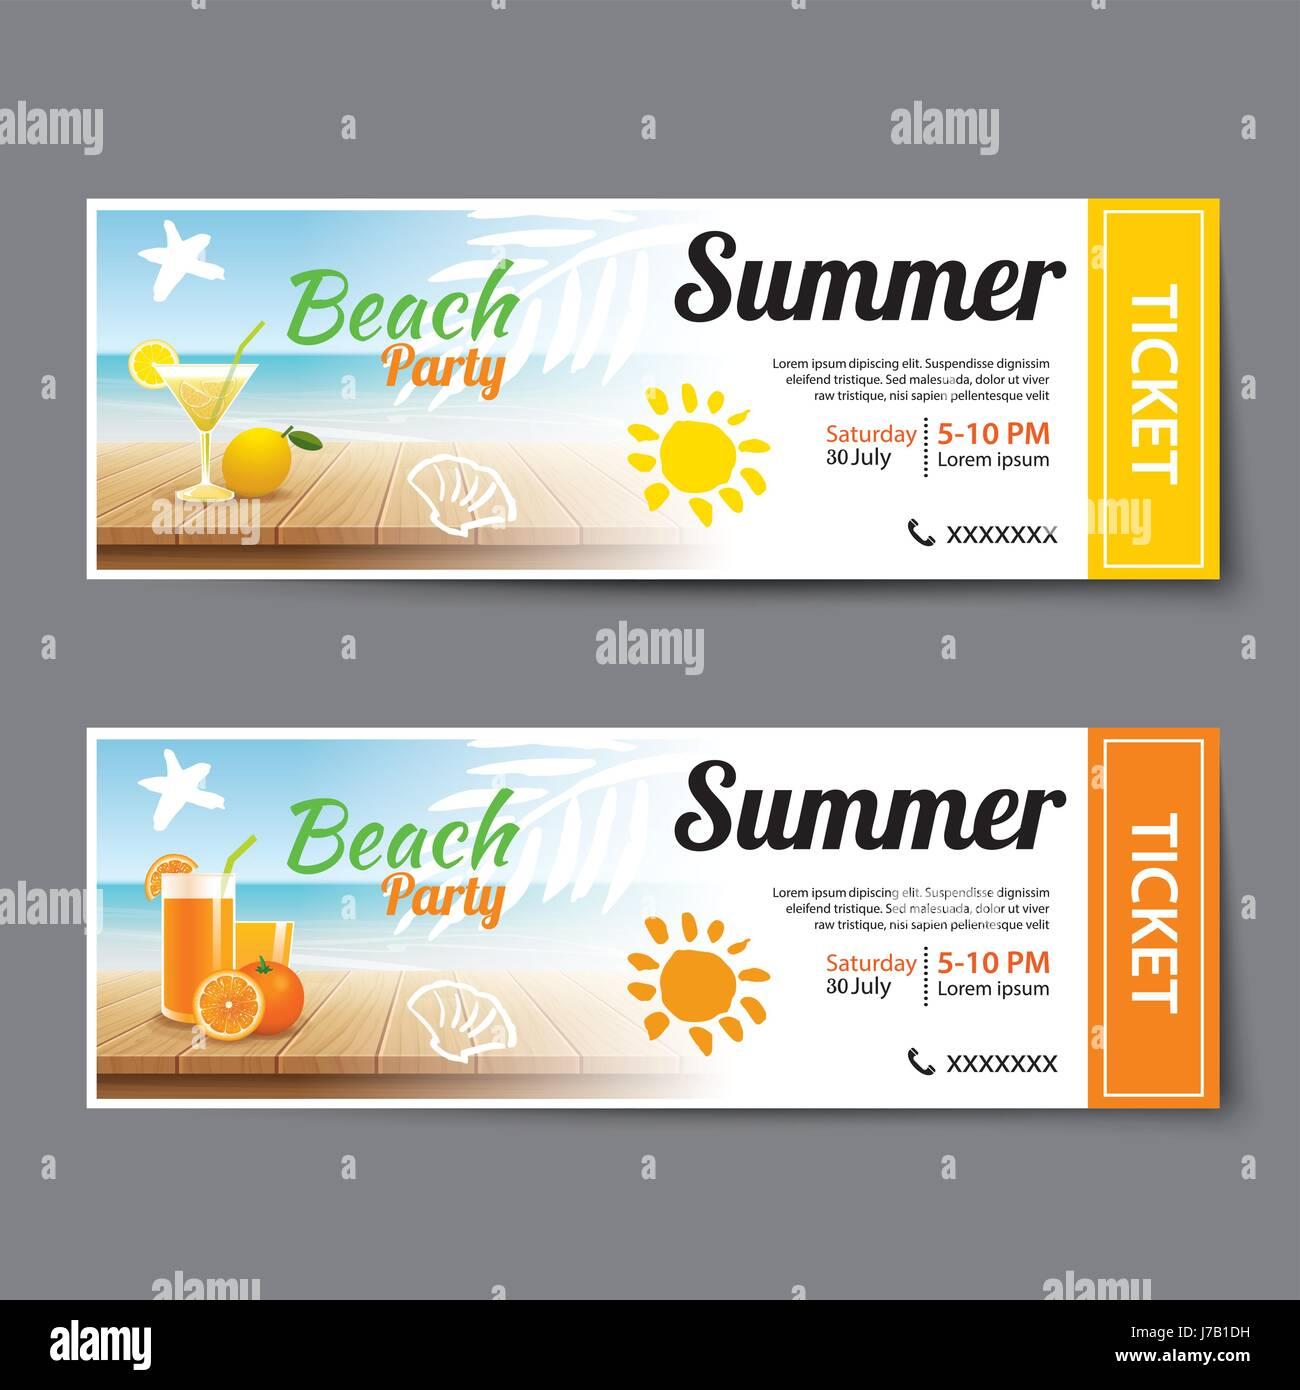 summer pool party ticket template stock vector art illustration